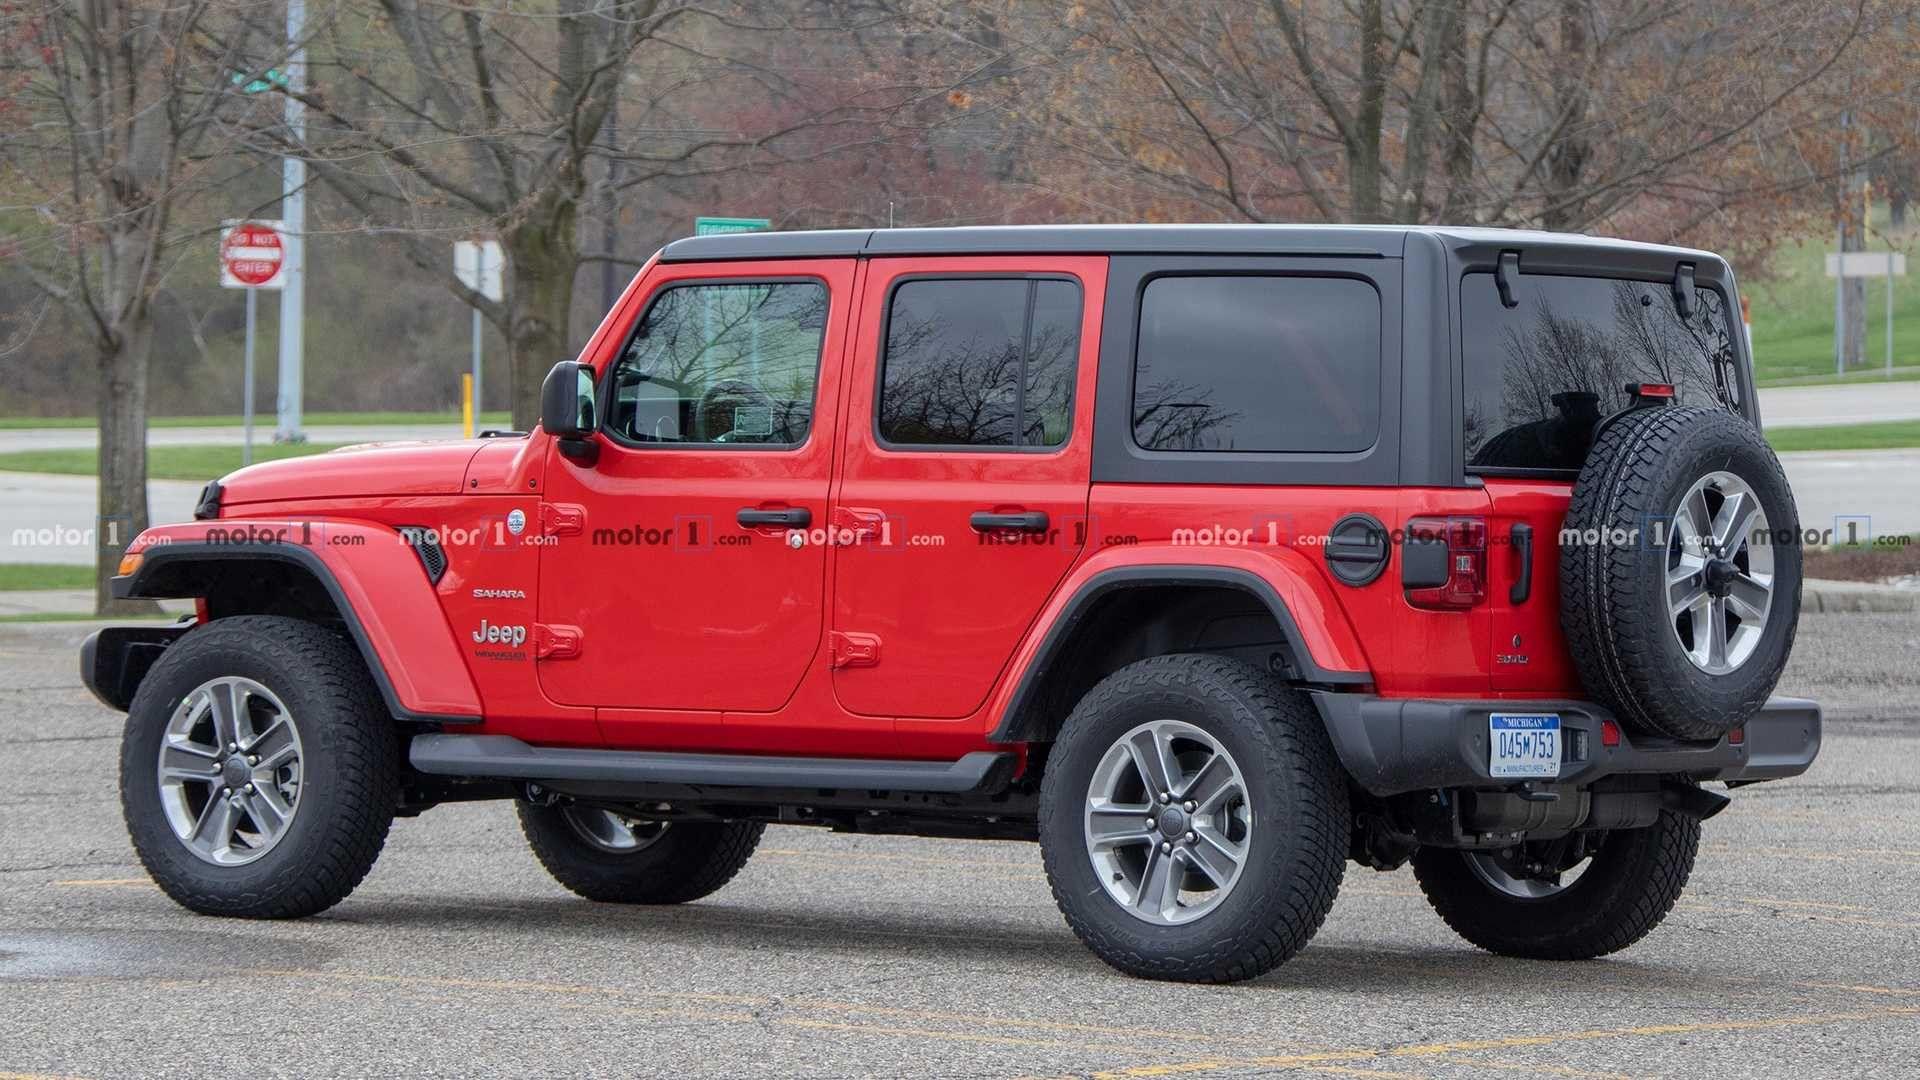 2020 Jeep Wrangler Diesel Spied Hiding In Plain Sight Jeep Wrangler Diesel Jeep Wrangler Jeep